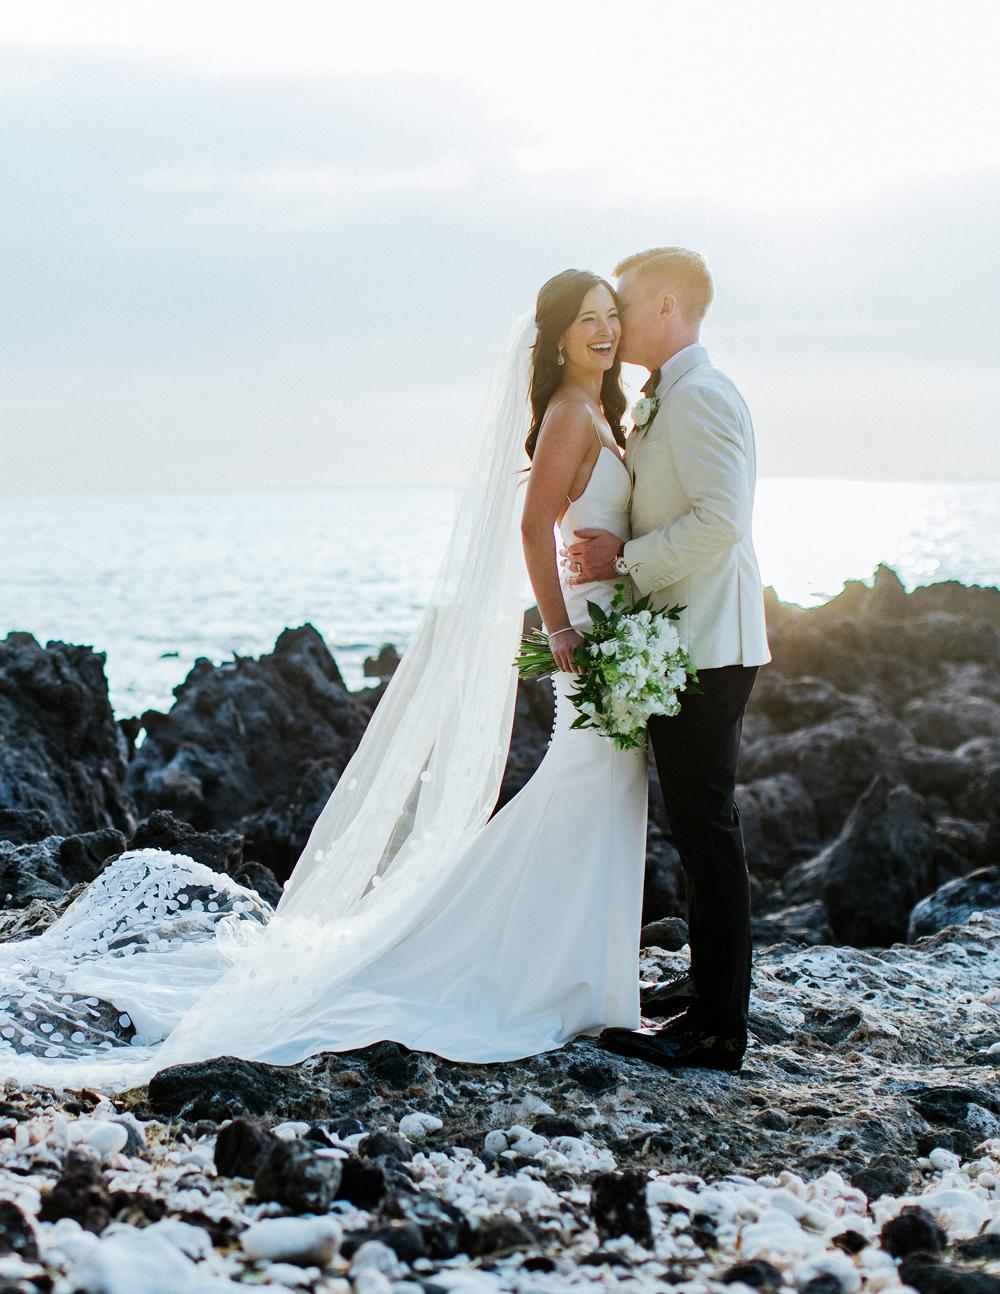 HANA & SAM | MAUNA KEA HOTEL, BIG ISLAND